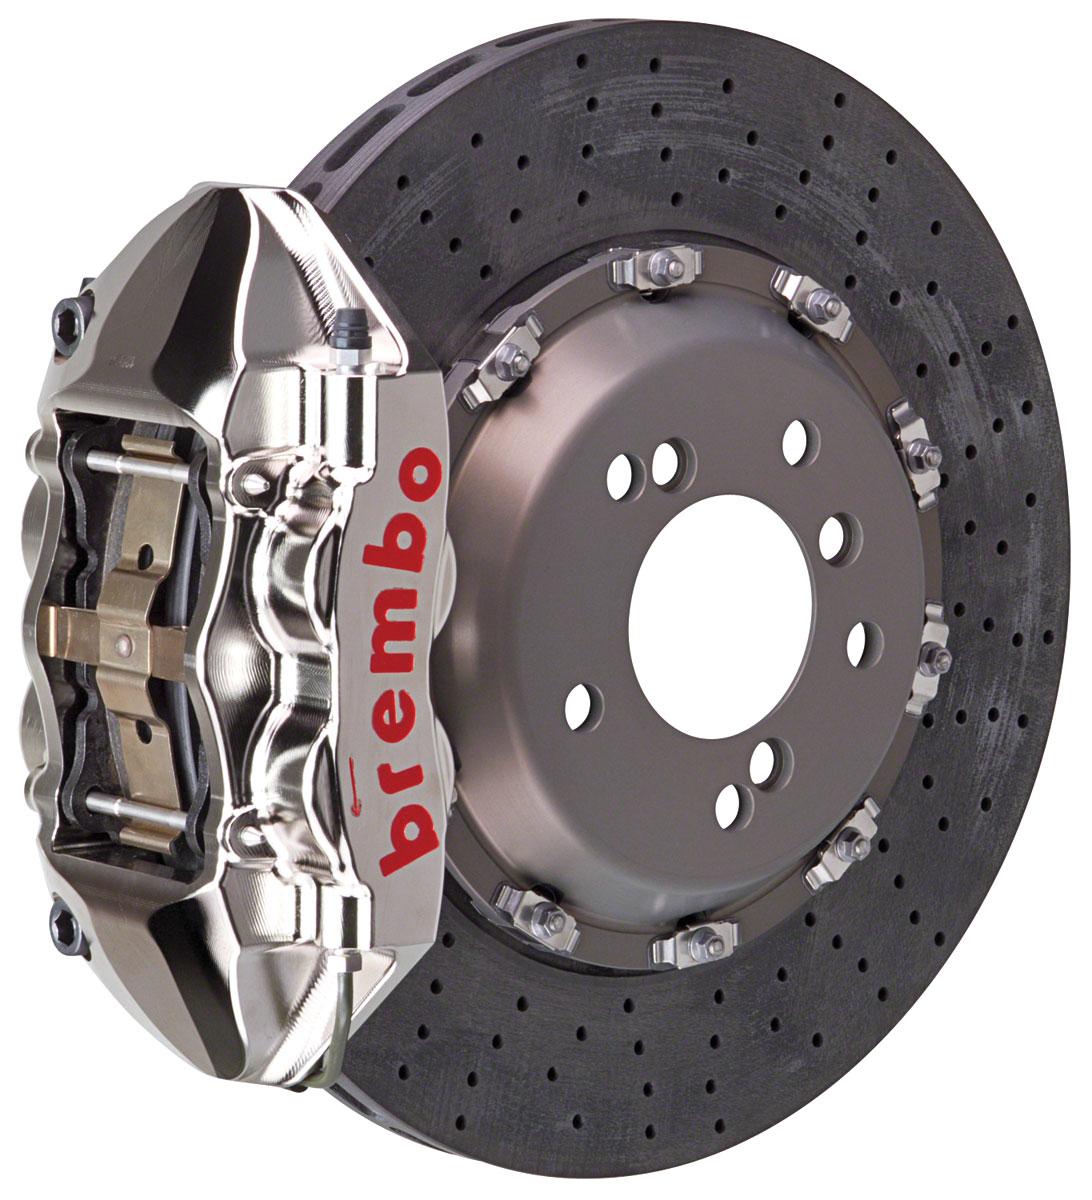 Brake Set, Brembo GT-R, 09-15 CTS-V, Rear, CCM-R 2pc 380 Rotor, 1pc 4P Caliper